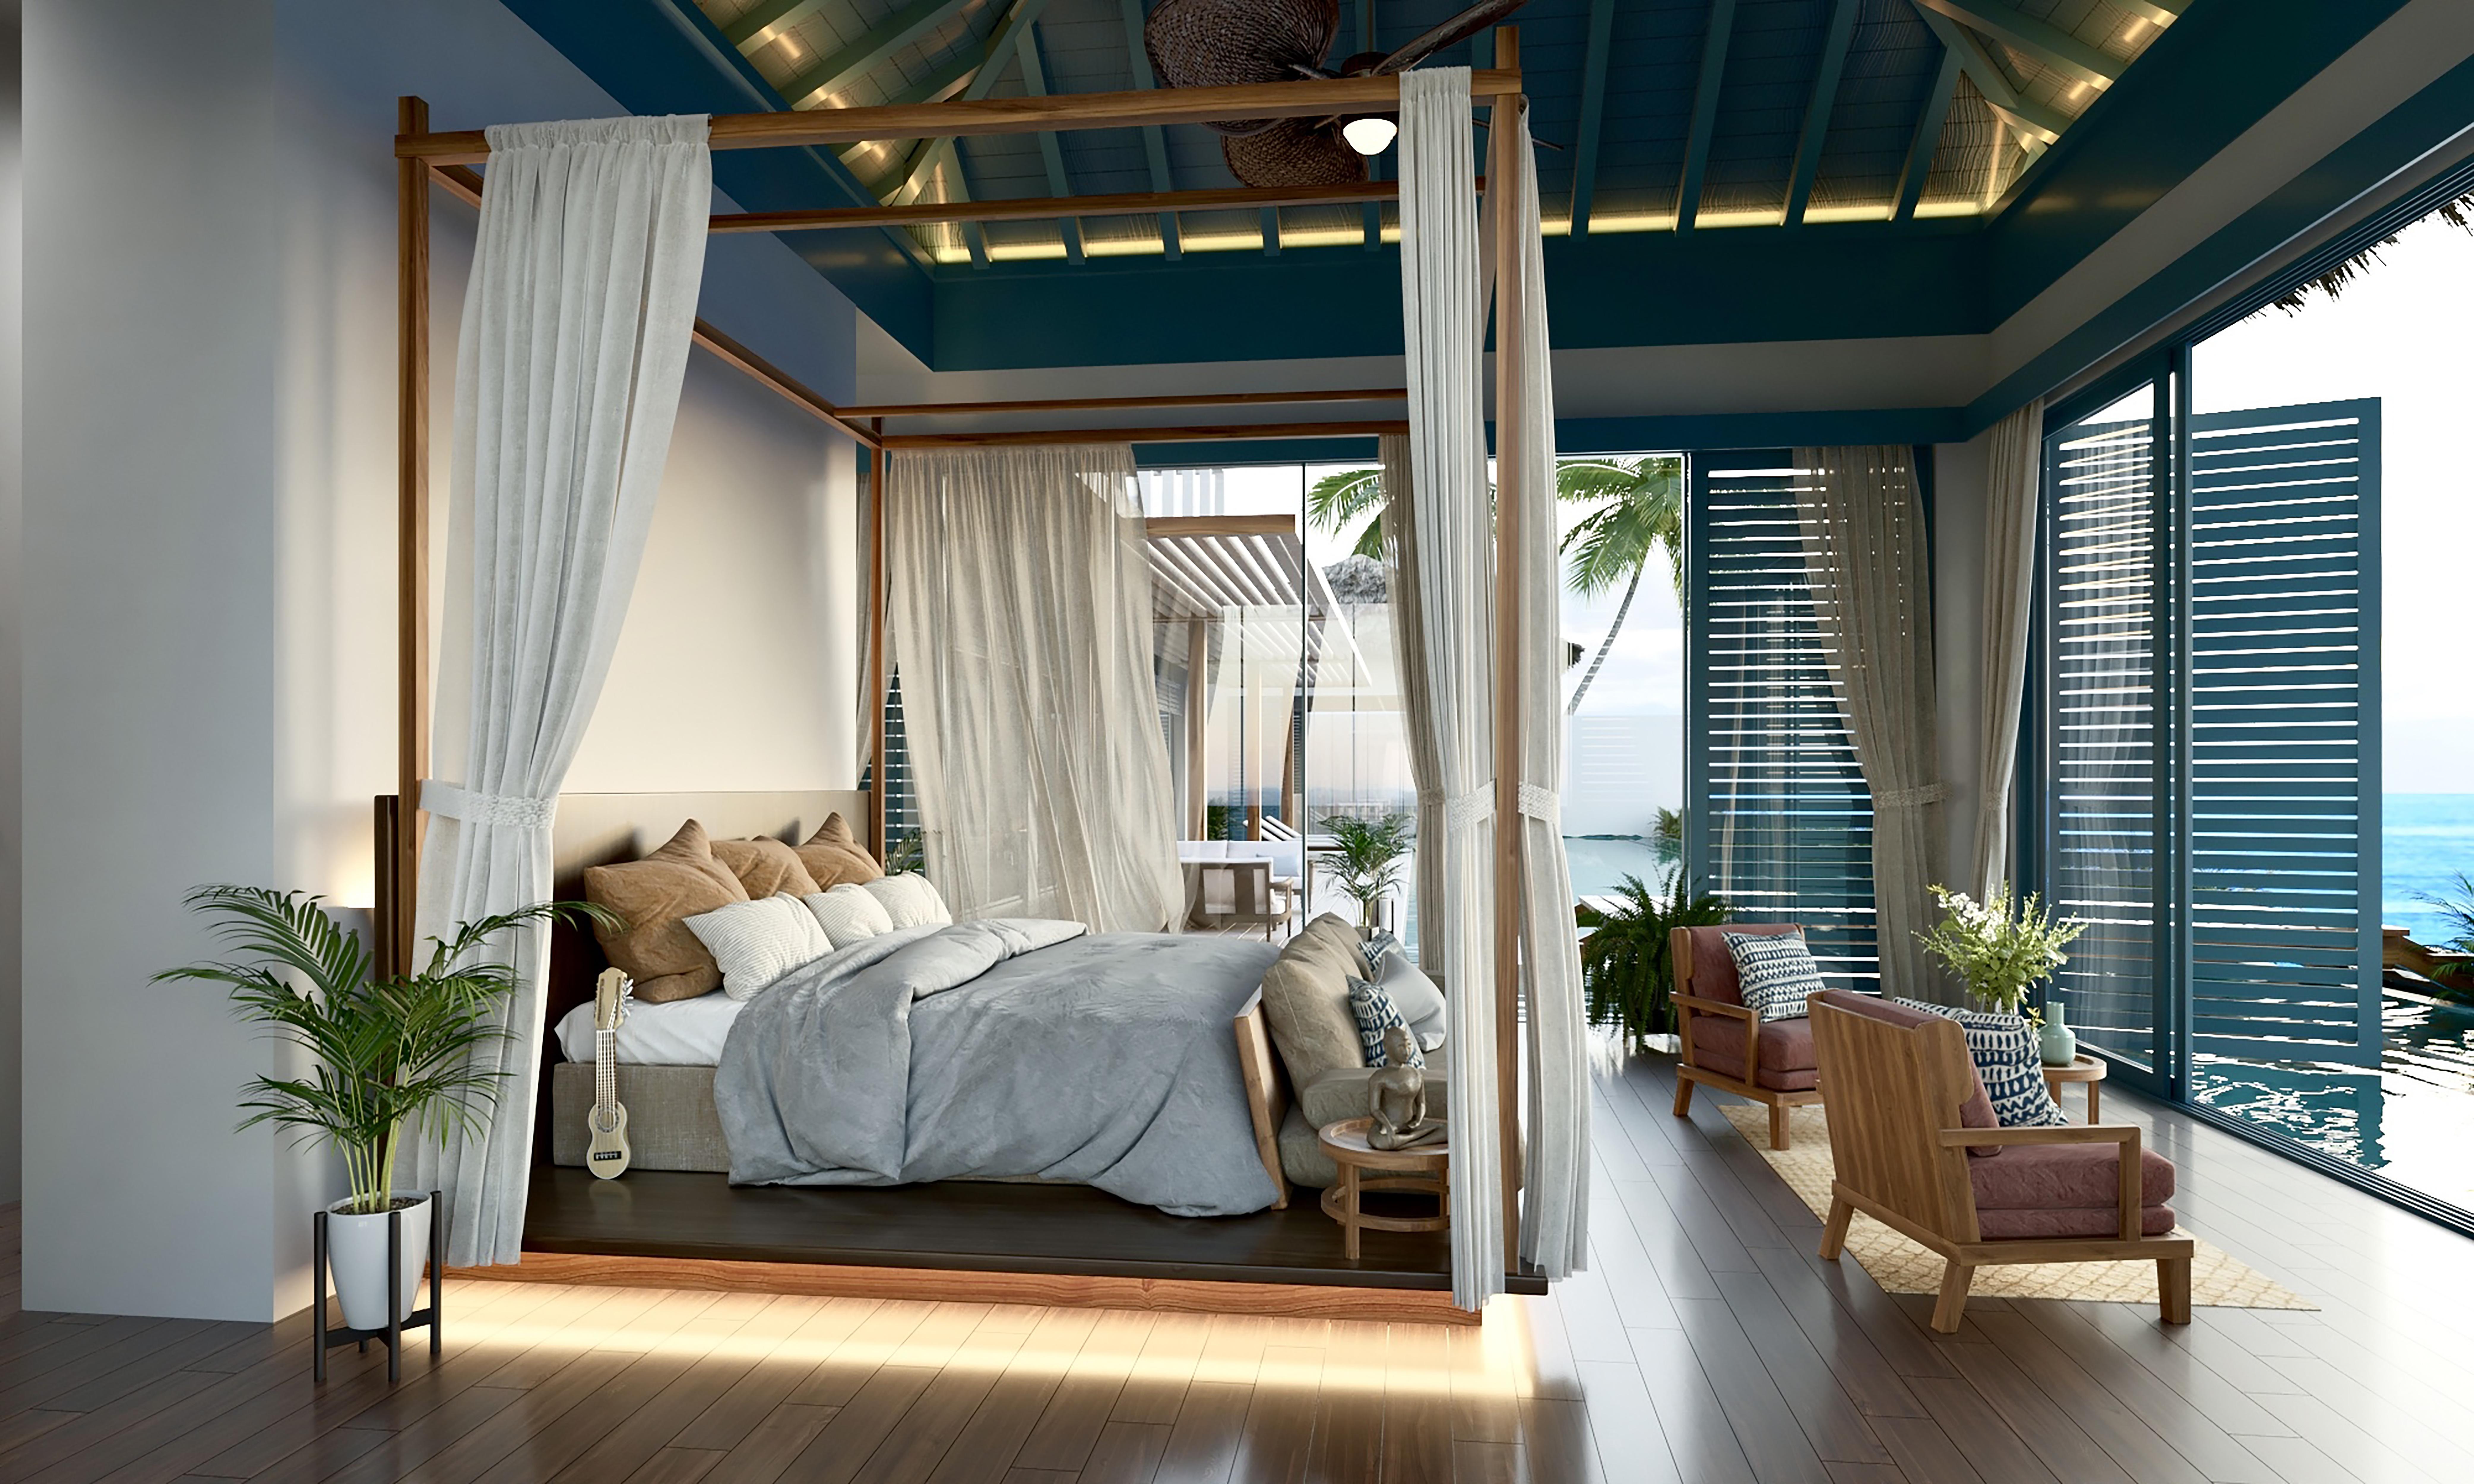 Raffles Maldives Meradhoo курорт за 1 миллион долларов